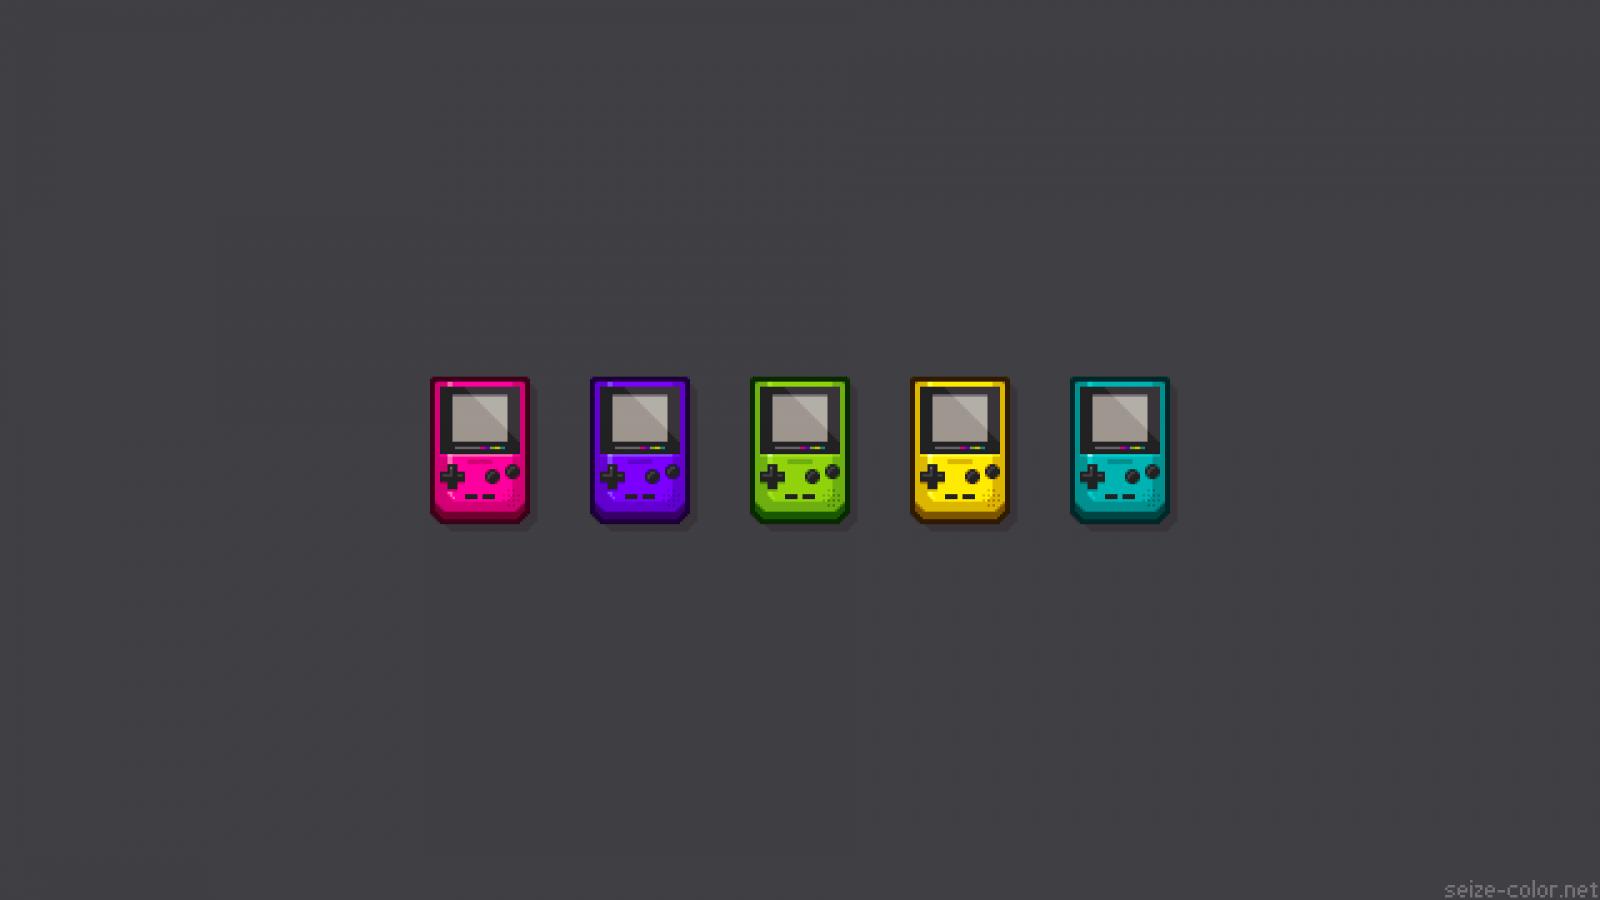 Wallpaper : pixel art, text, logo, brand, GameBoy Color ...